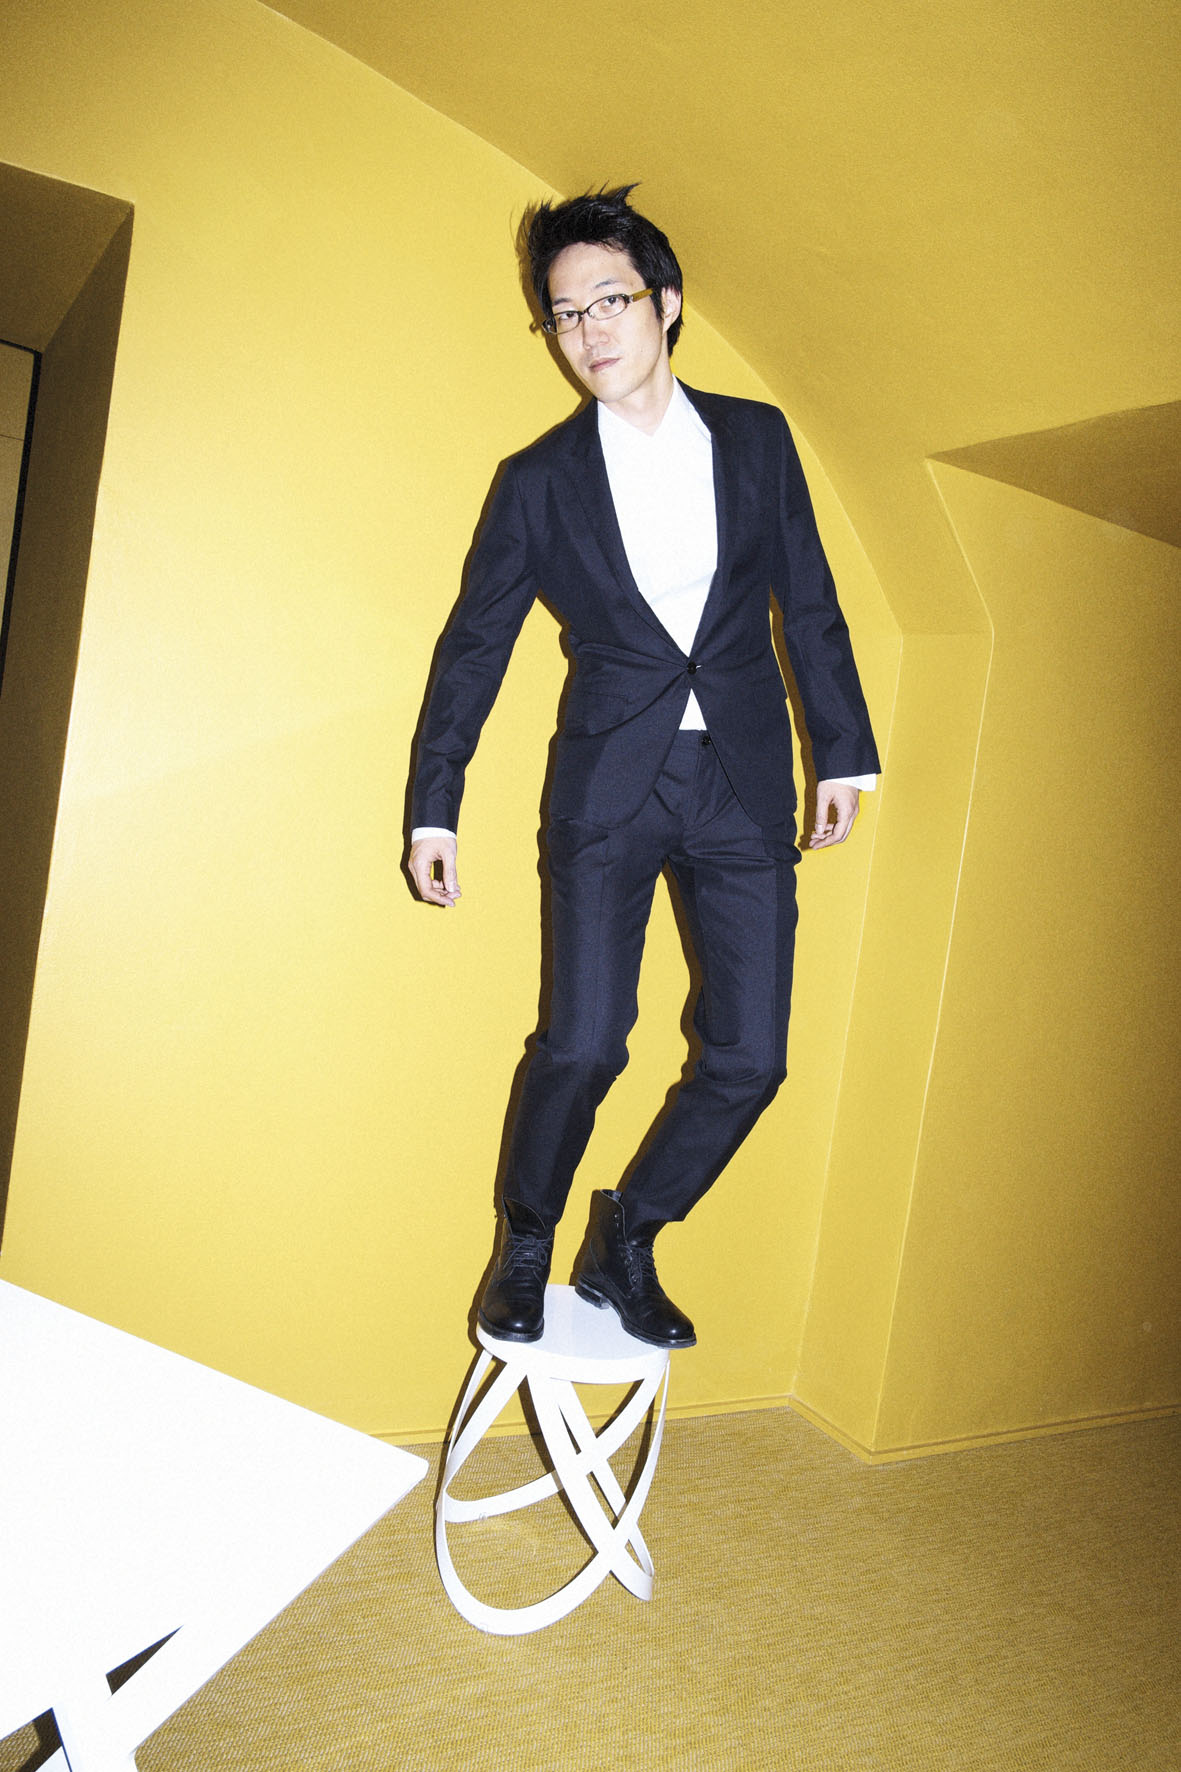 "L'Uomo Vogue January 2013 ""Oki Sato Nendo"" | Marco Pietracupa | L'Uomo Vogue | Nik Piras | Numerique Retouch Photo Retouching Studio"